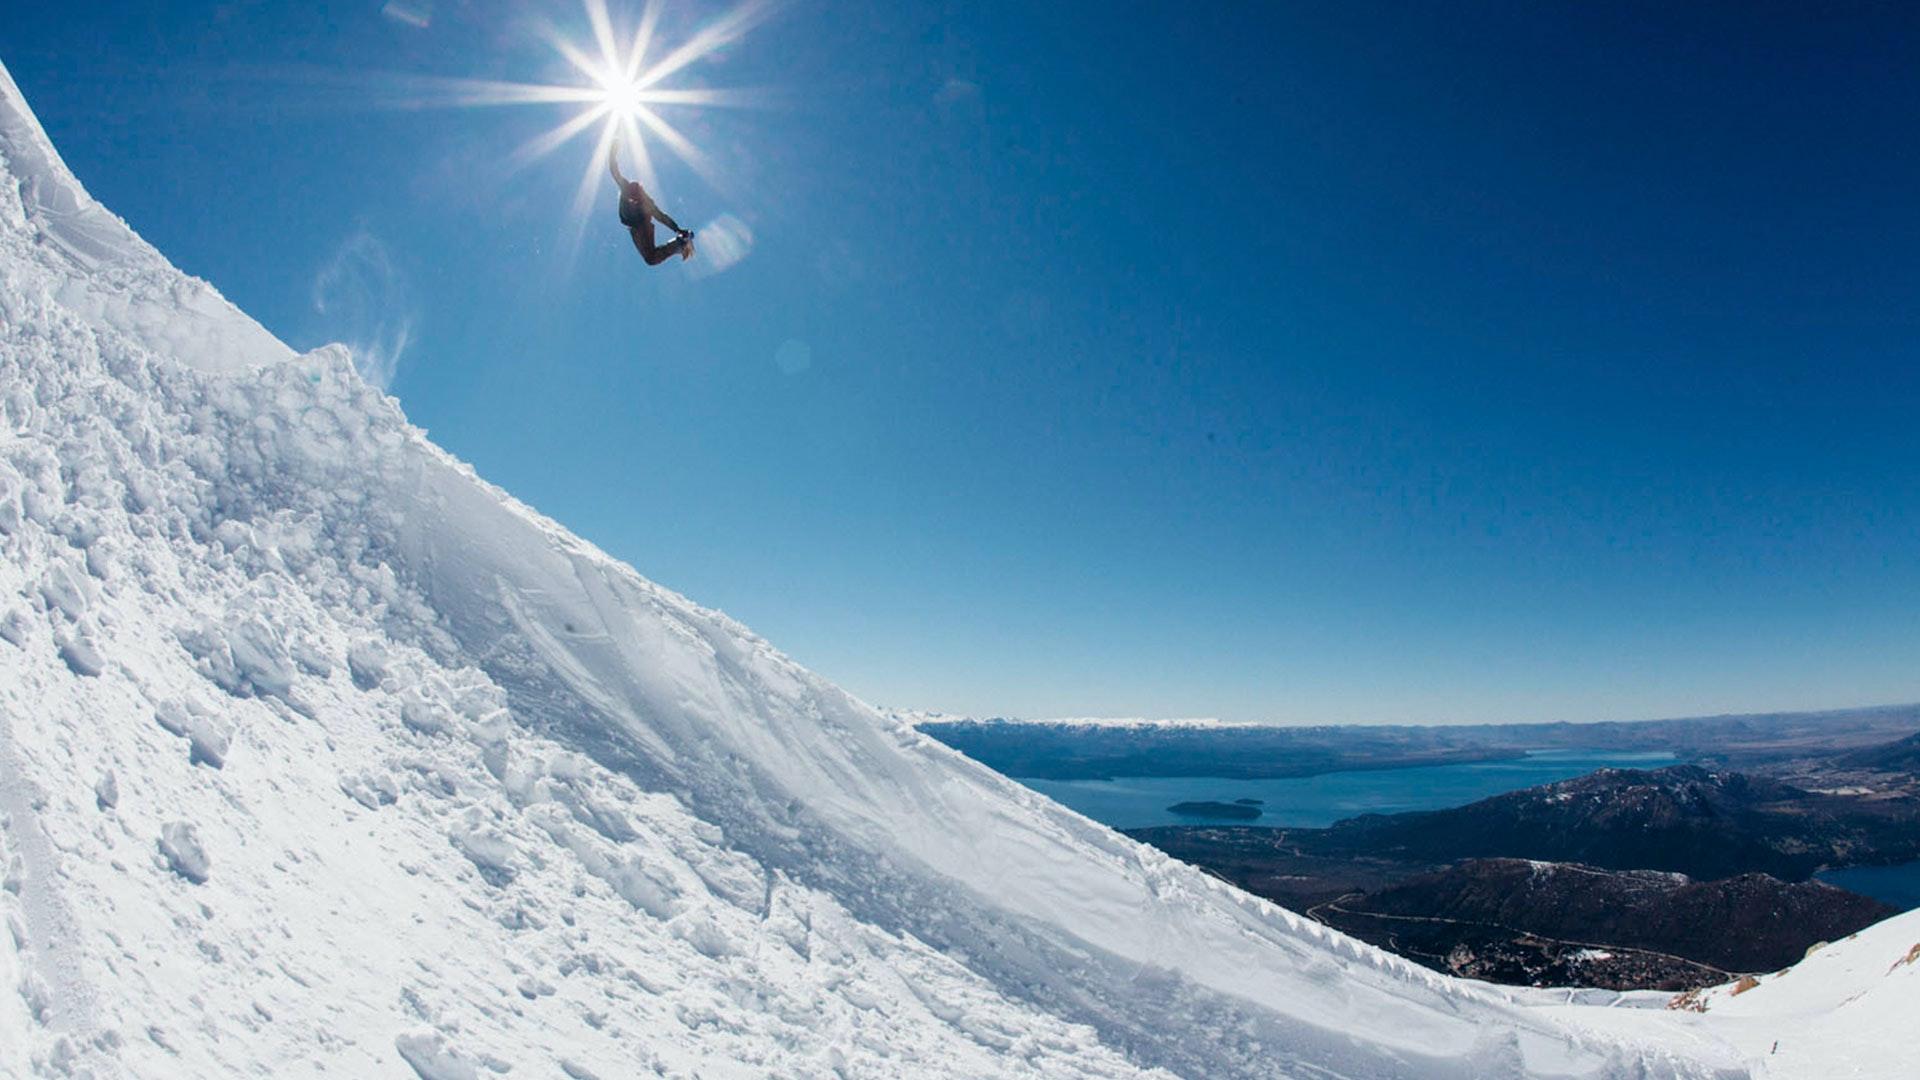 Snowboard Wallpaper Arthur Longo In Argentina Wh